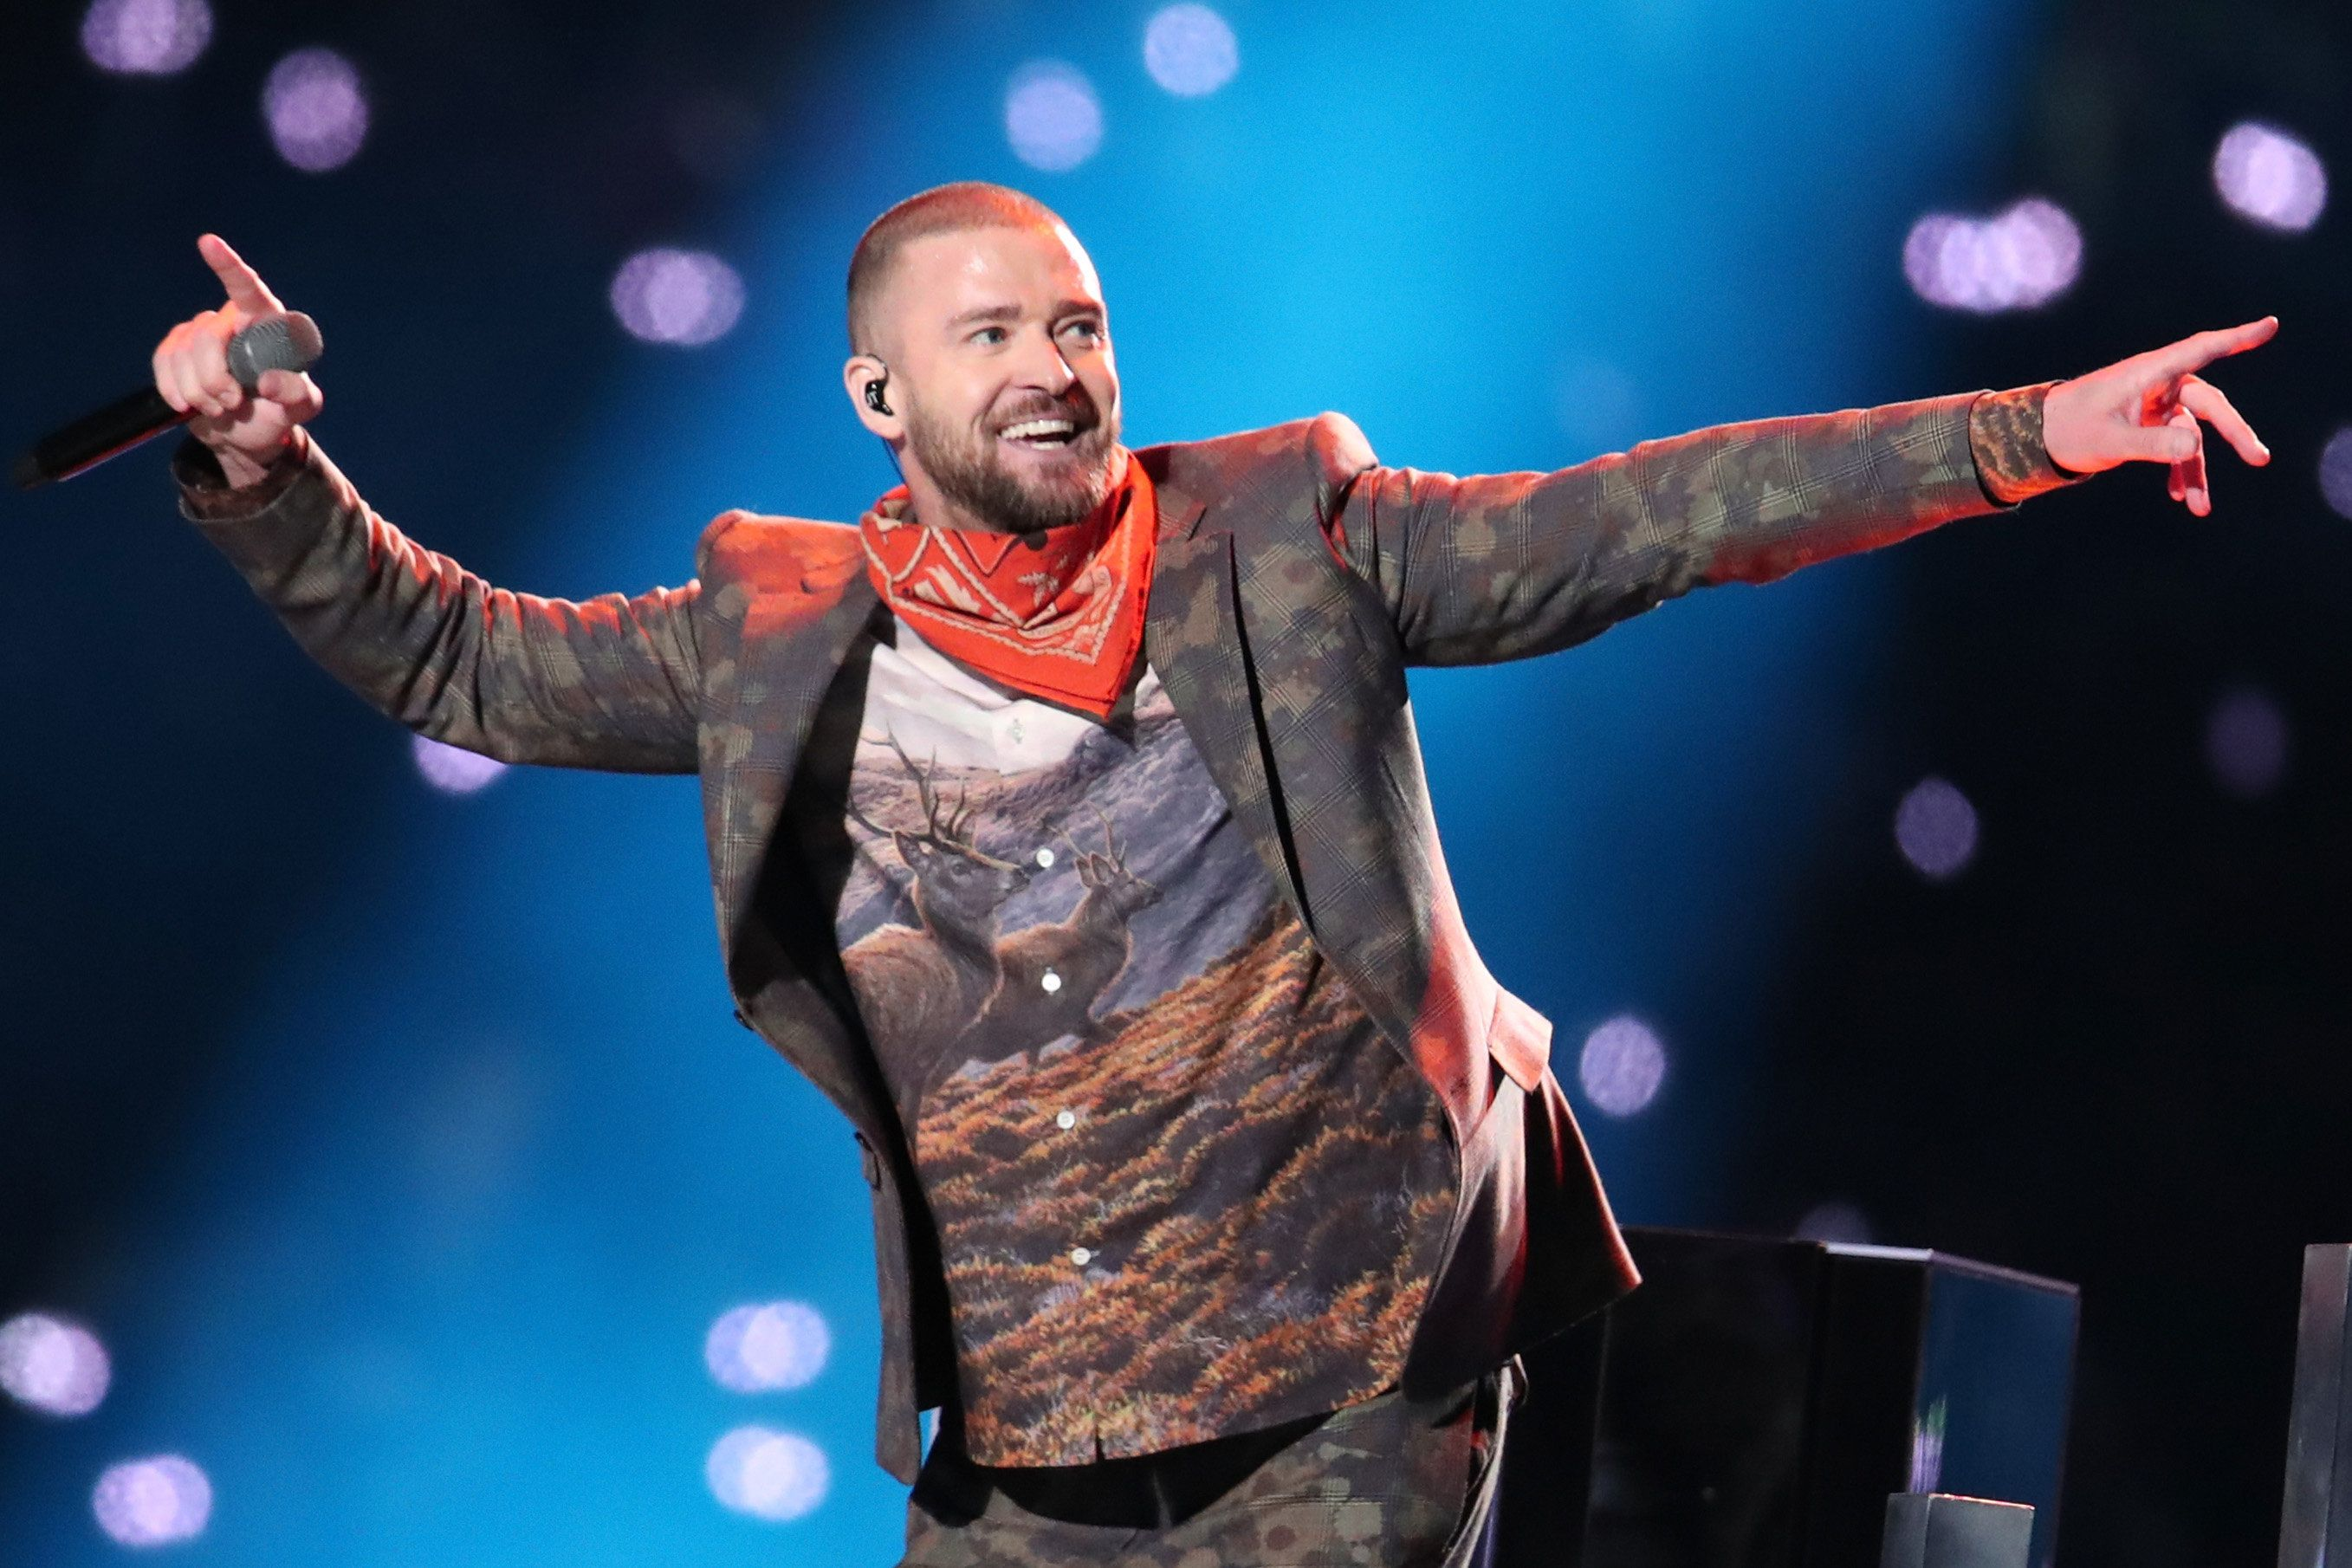 Justin Timberlake Pays Tribute To Prince At Super Bowl Halftime